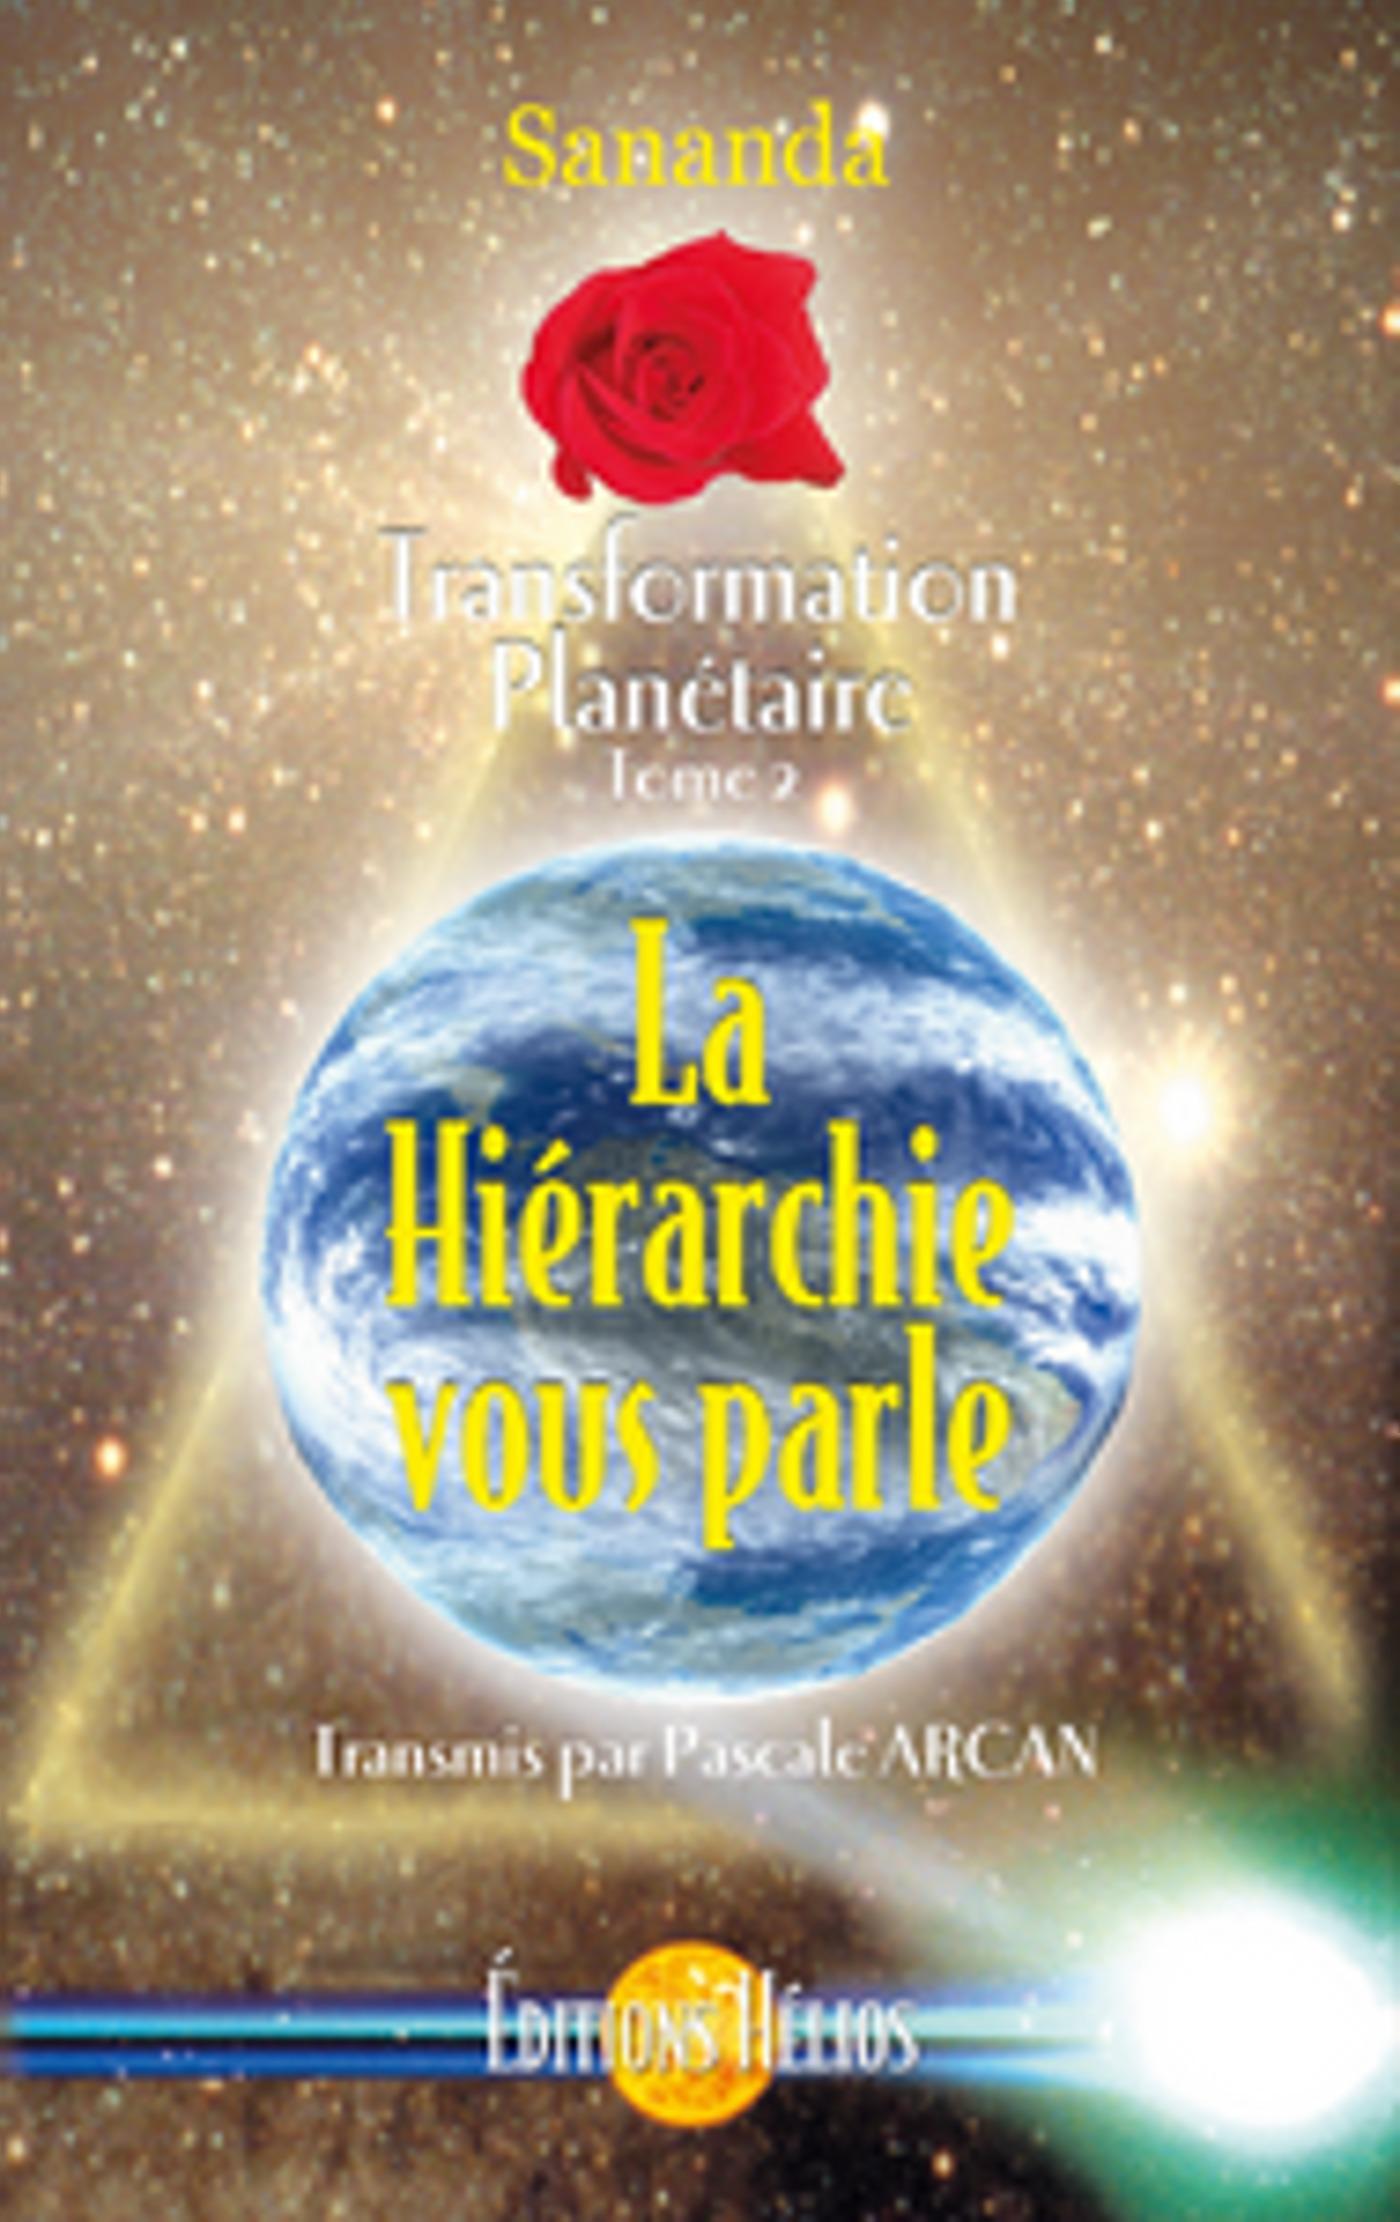 Hierarchie vous parle - transf. planetaire t.2